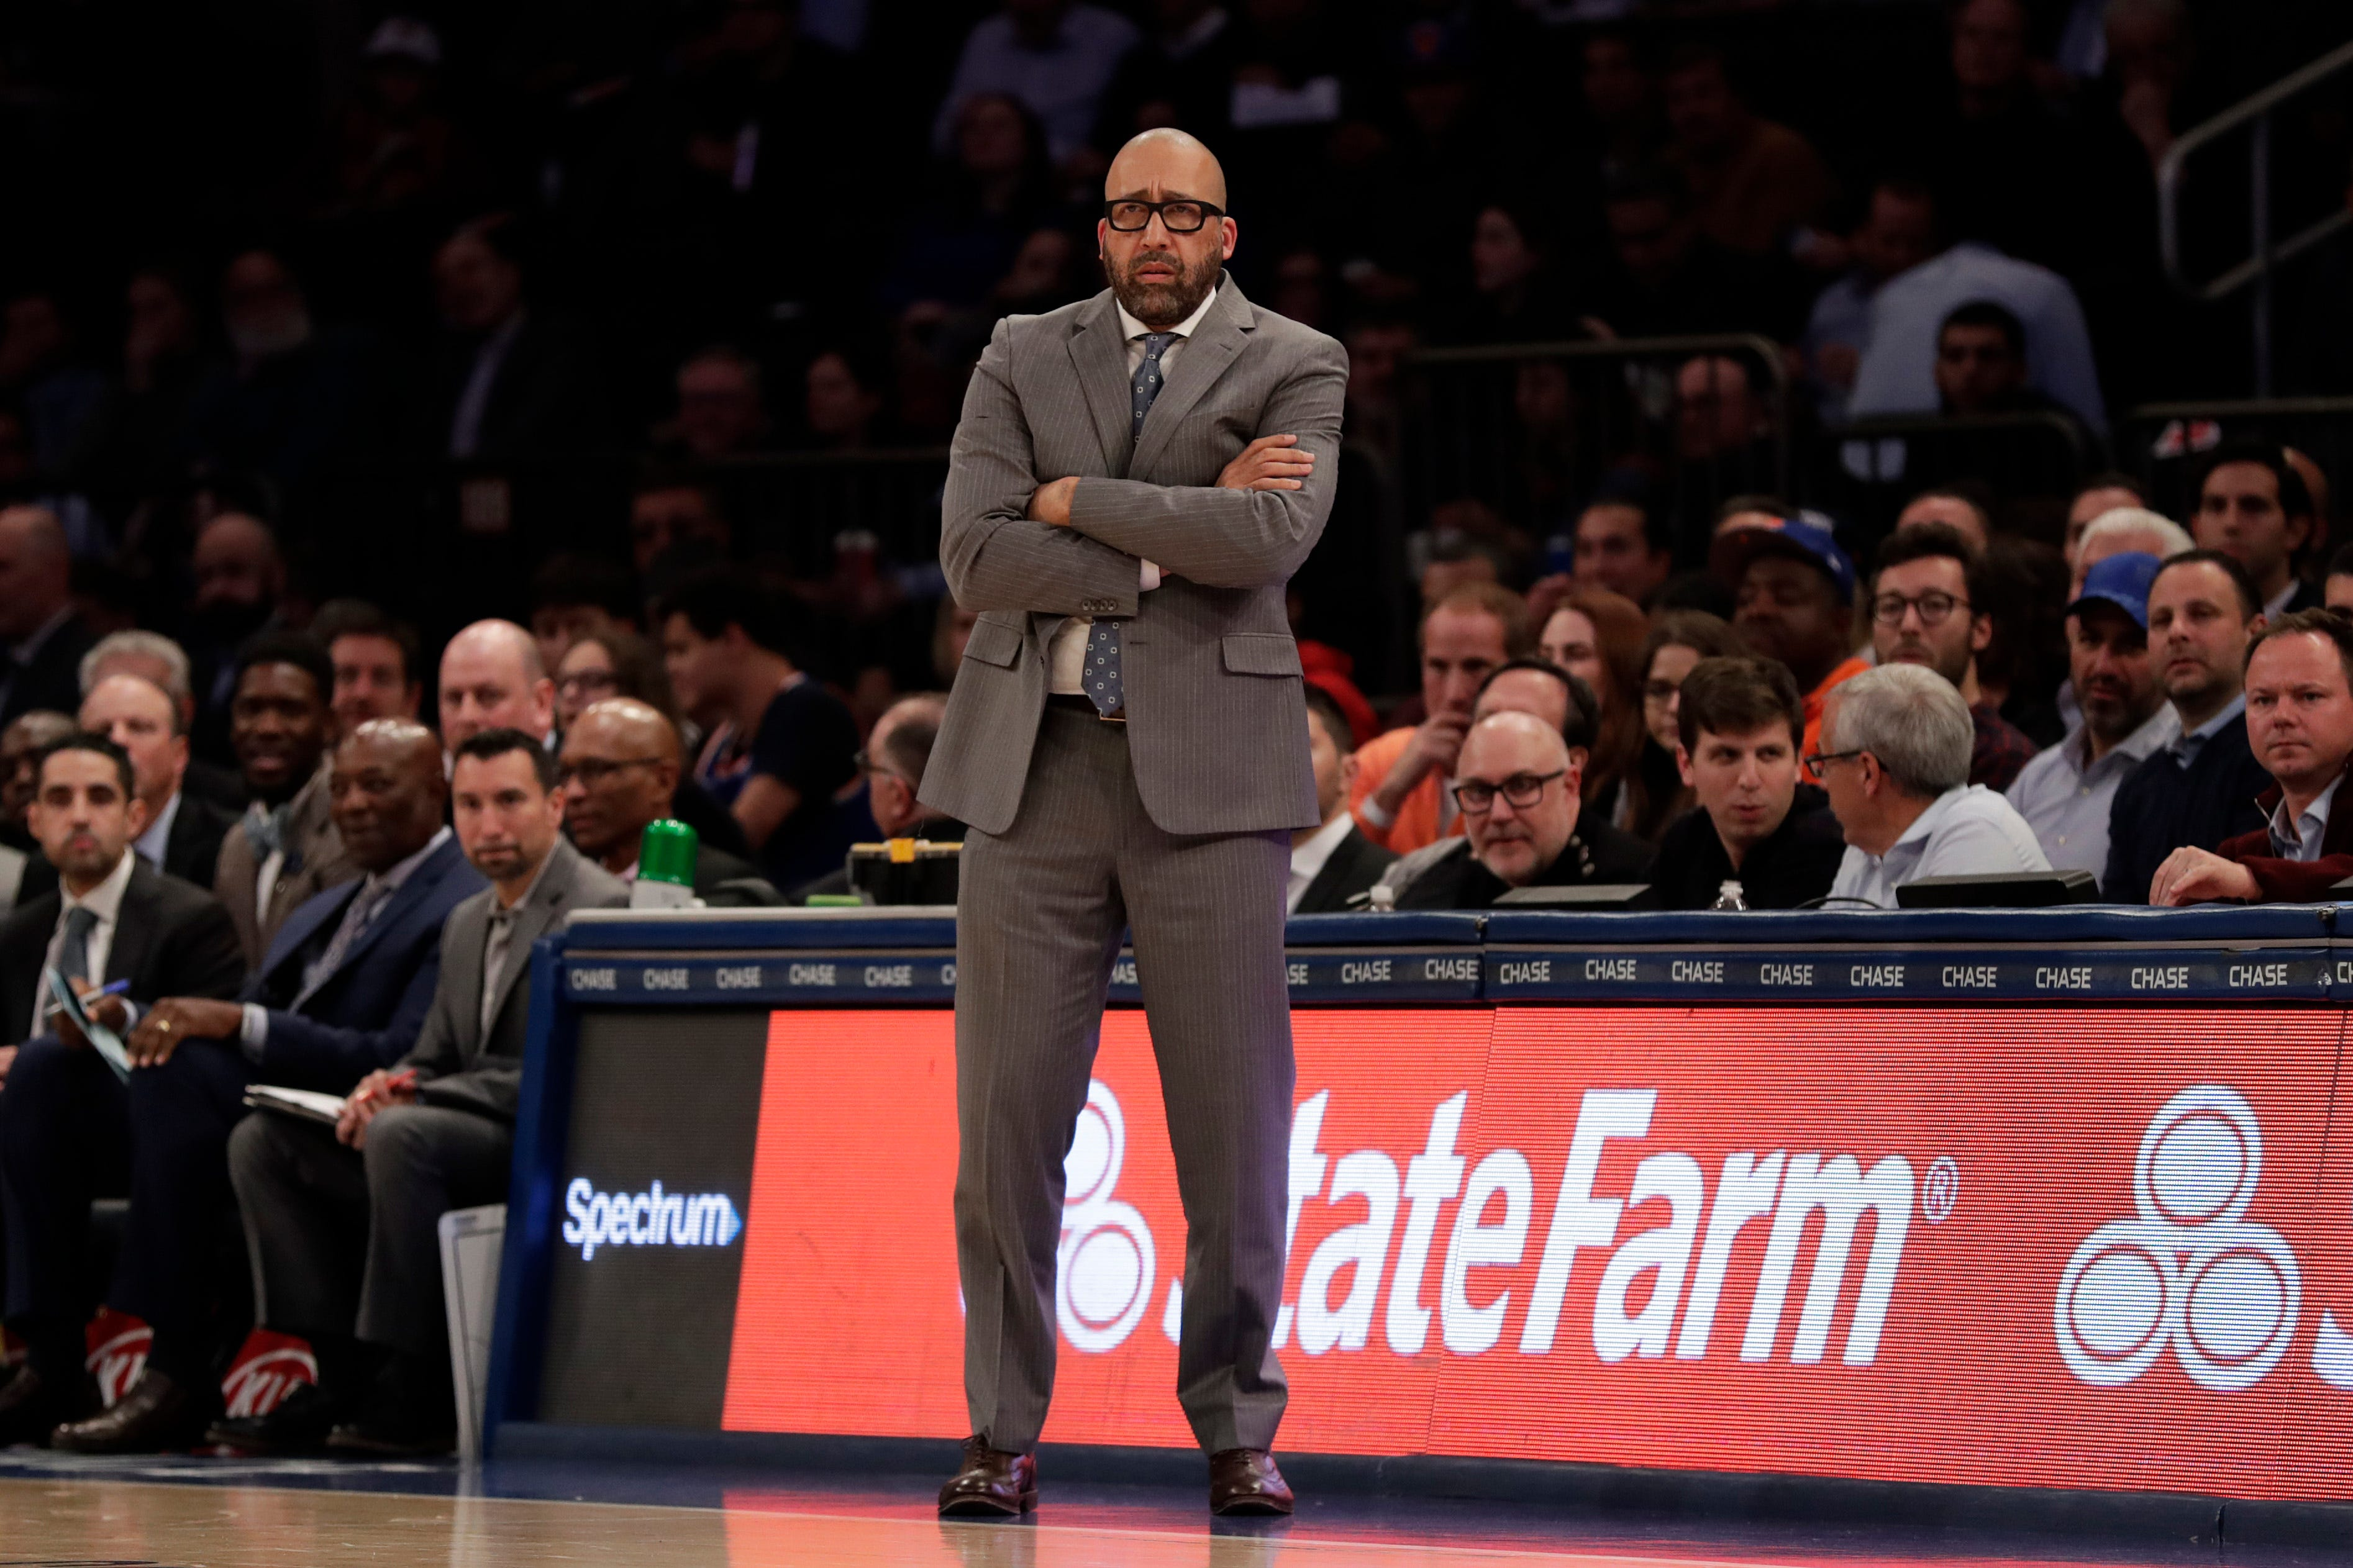 Two days later, Knicks address firing David Fizdale as coach